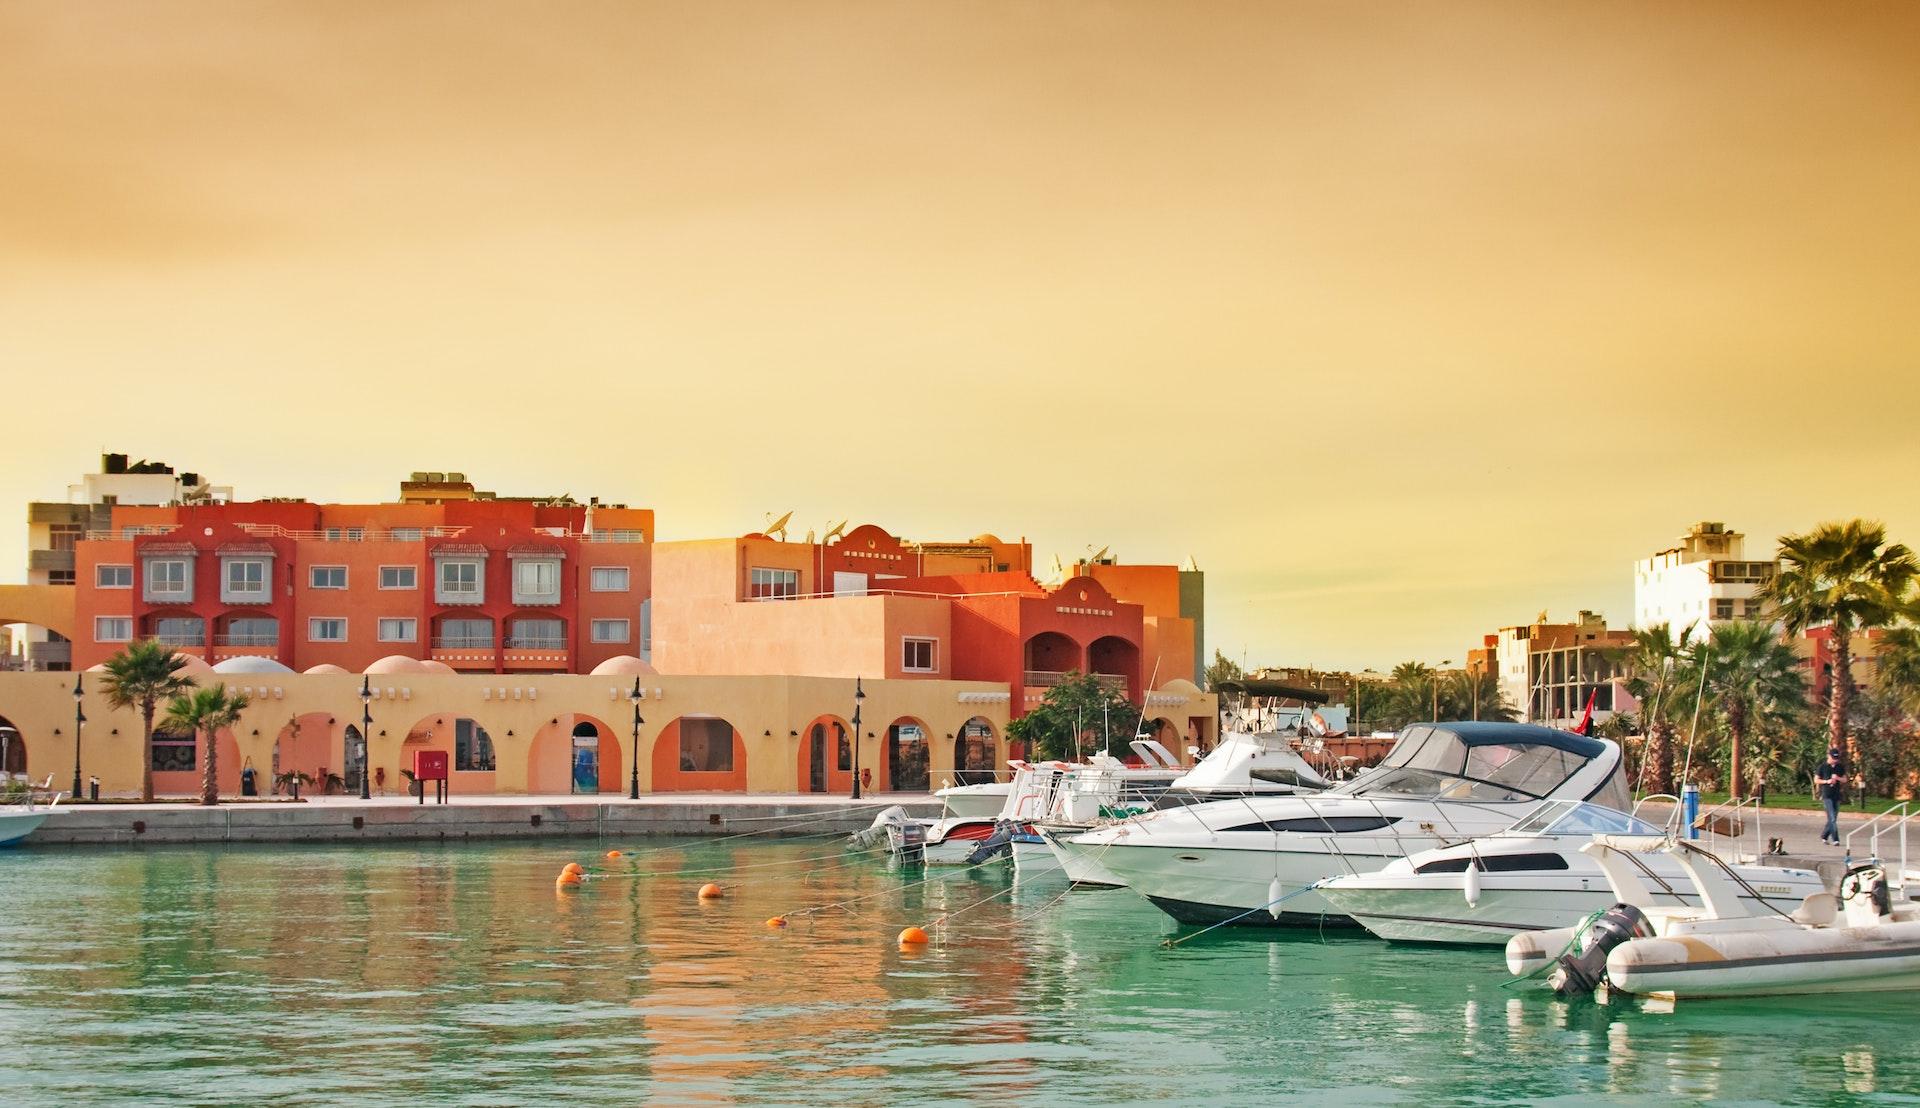 Hurghada © danilovi, Getty Images